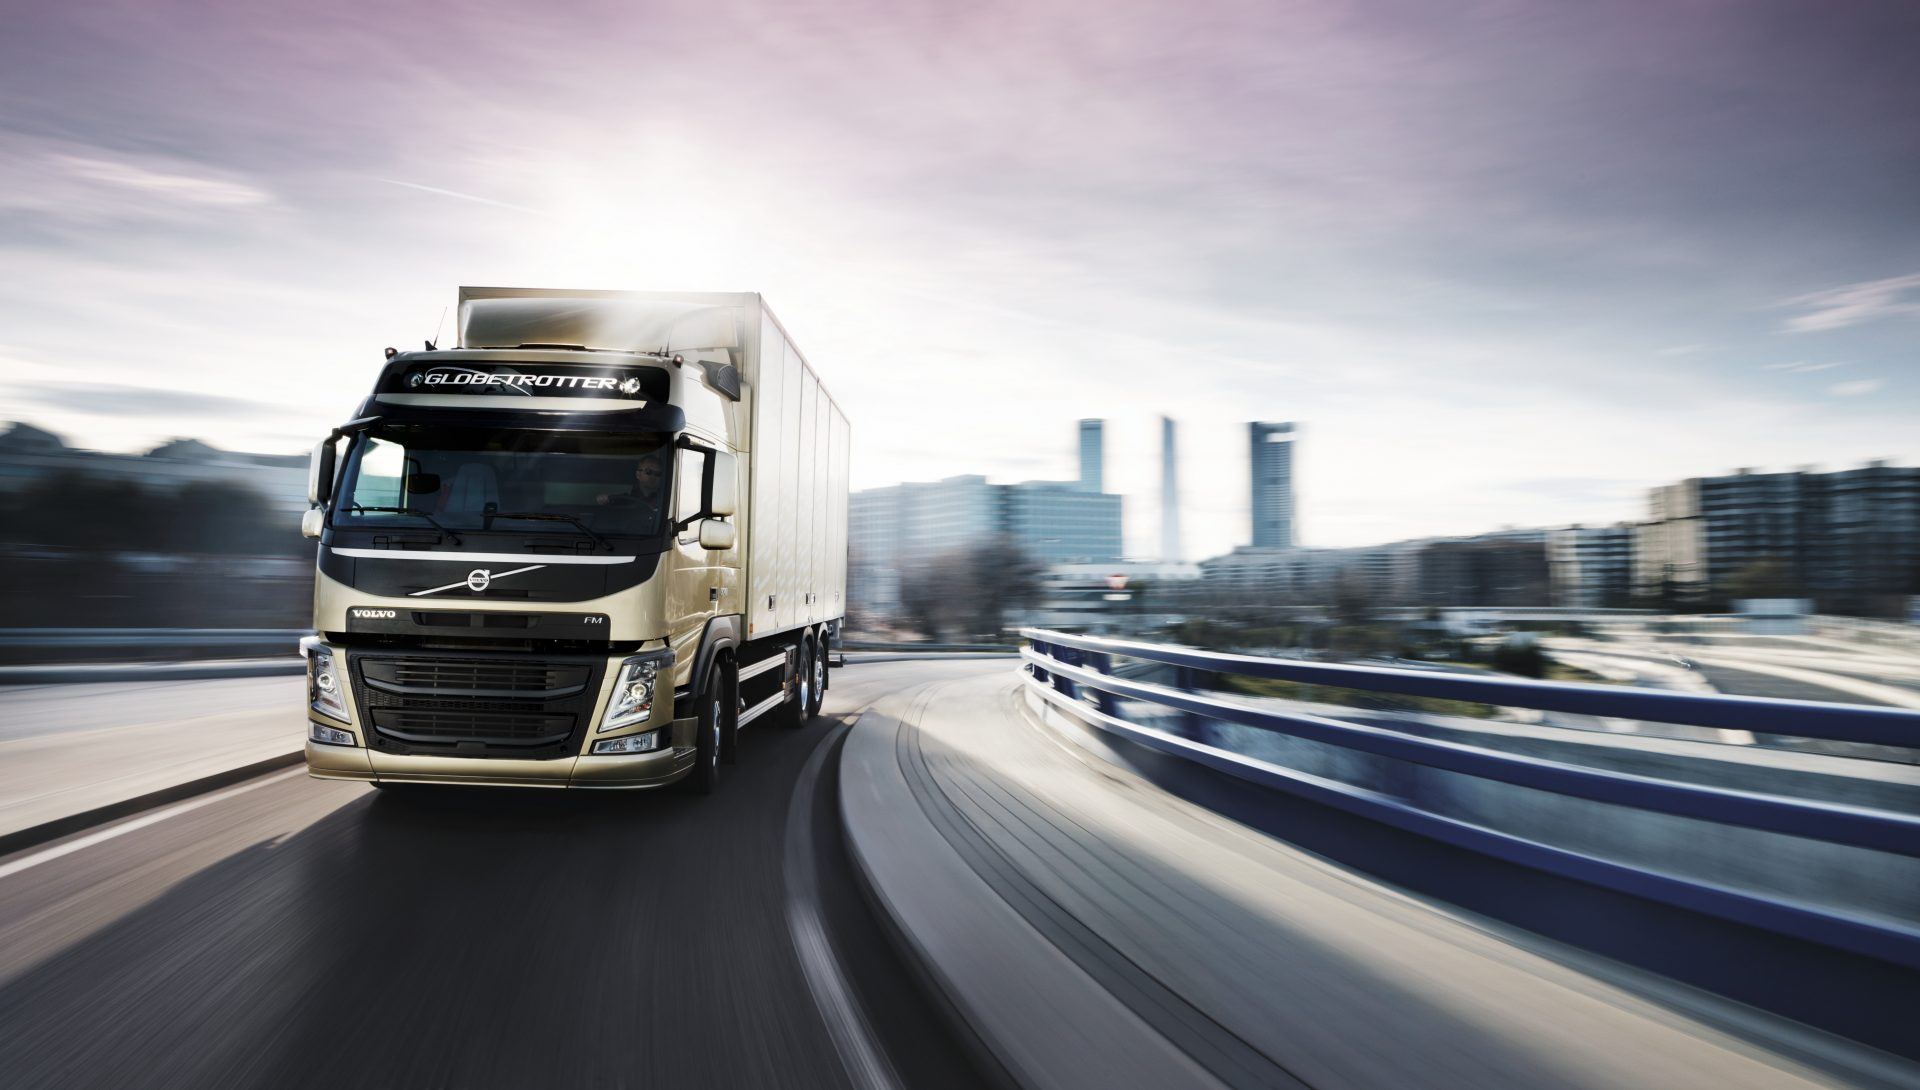 Transport IT software